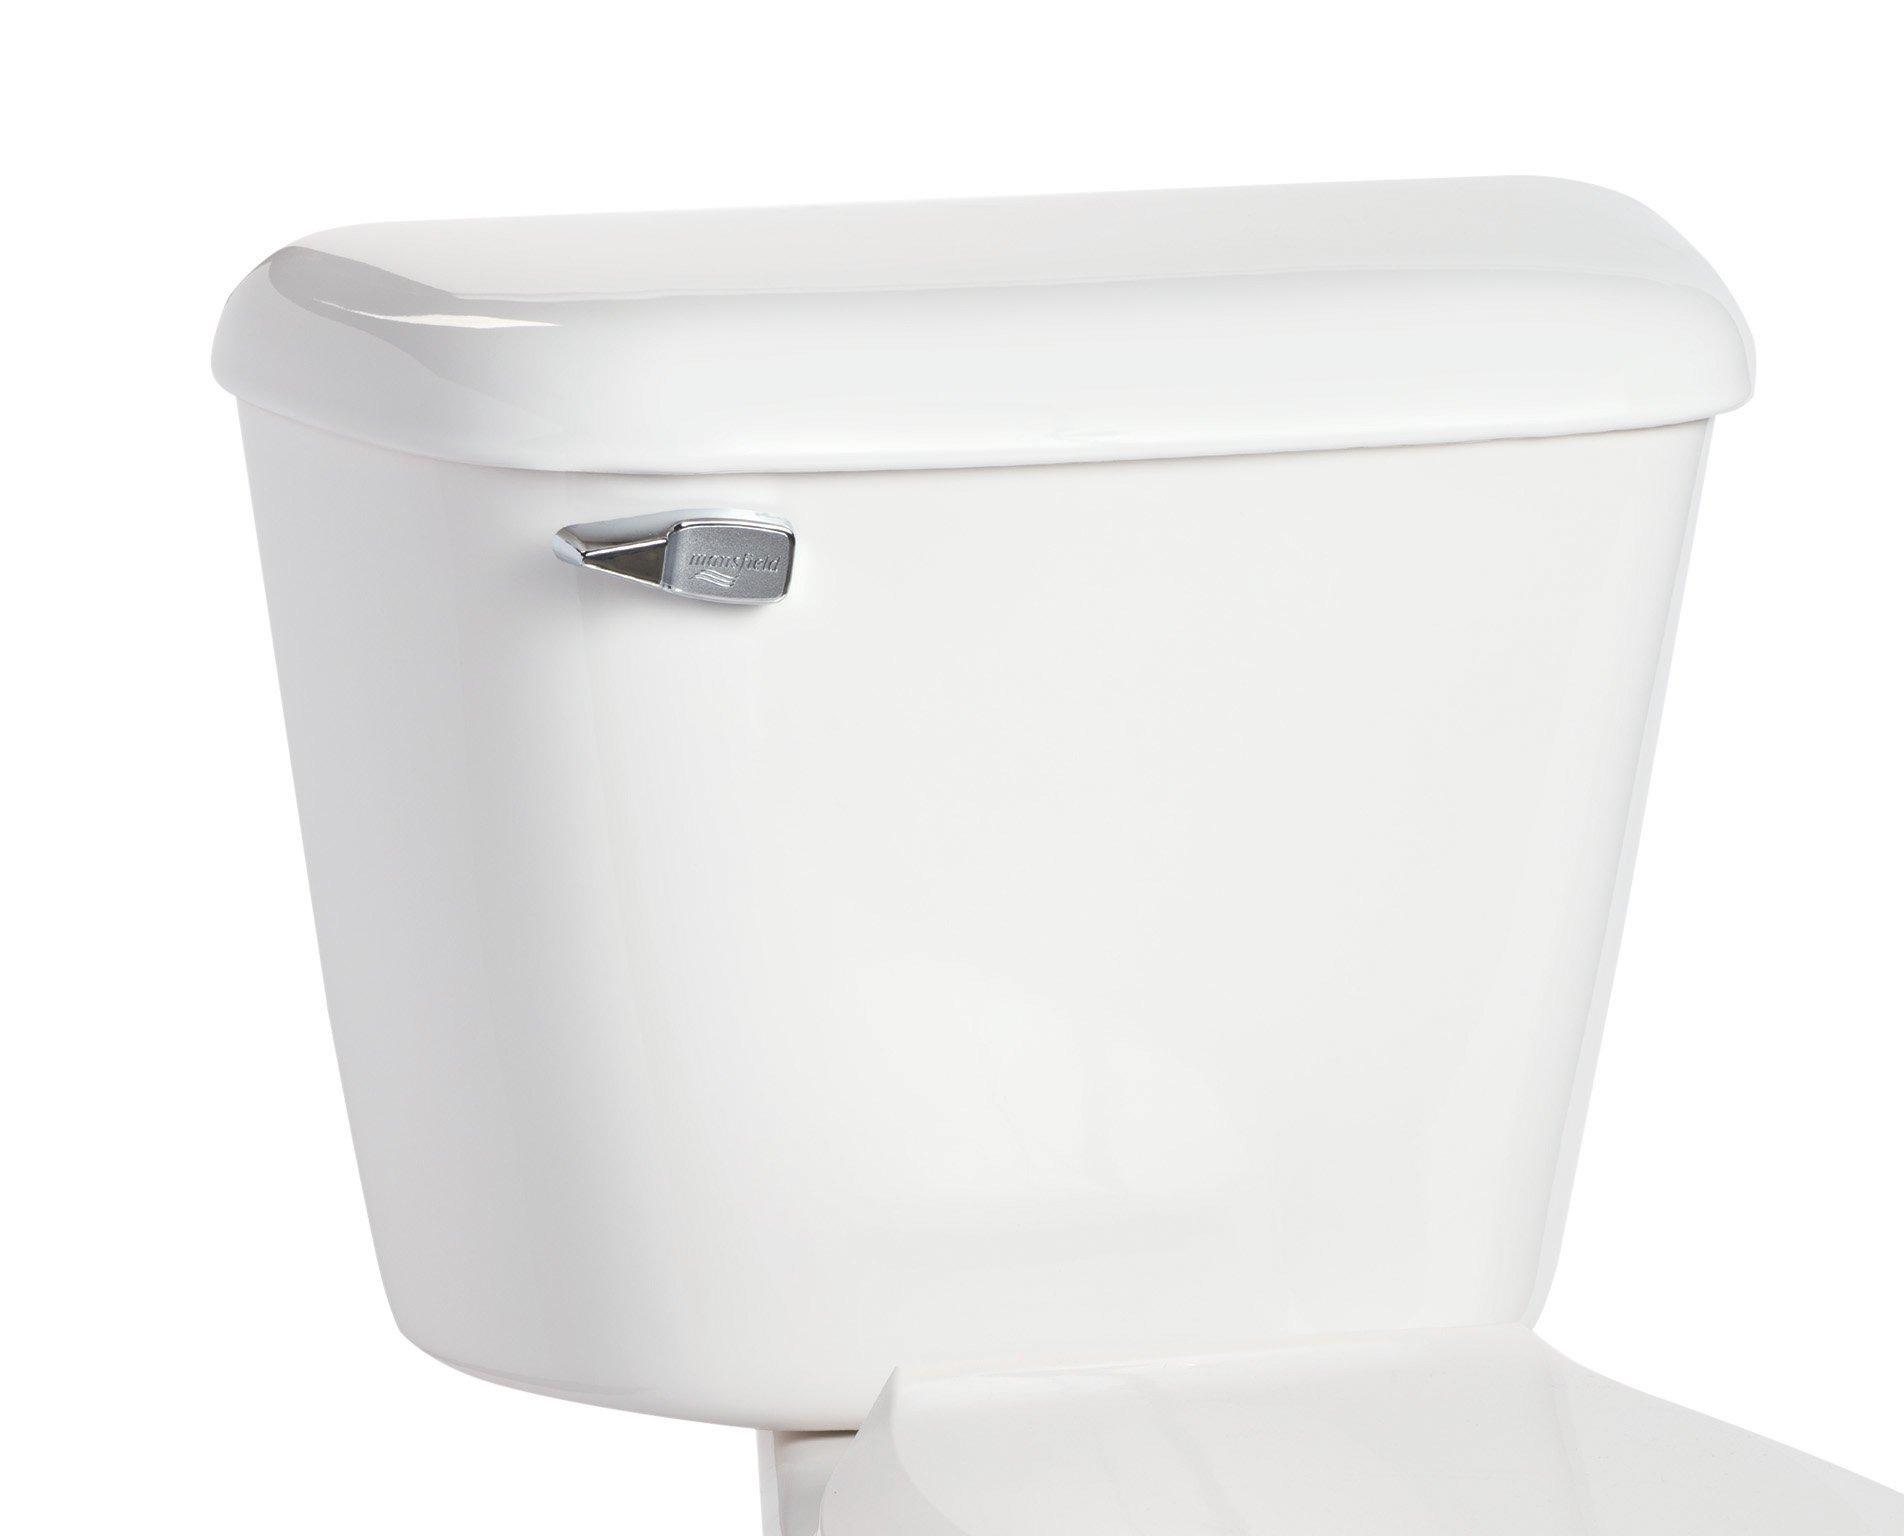 Mansfield 160WHT Alto Toilet Tank, White by Mansfield